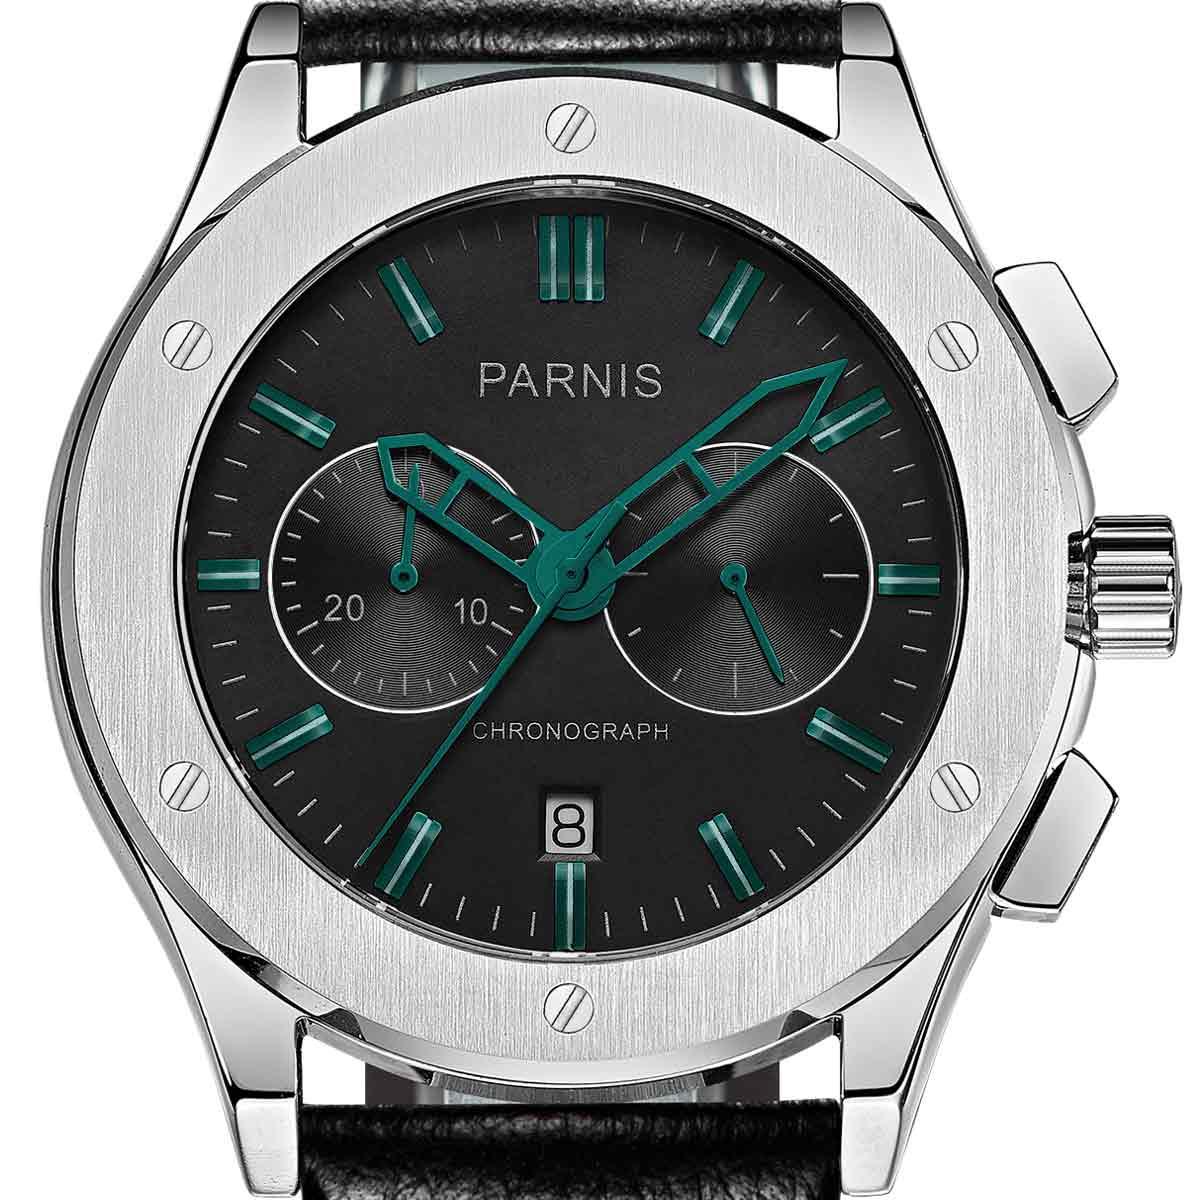 【NEW】PARNIS パーニス クォーツ 腕時計 [P6025-S5EL-BkgrBK] 並行輸入品 純正ケース メーカー保証12ヶ月